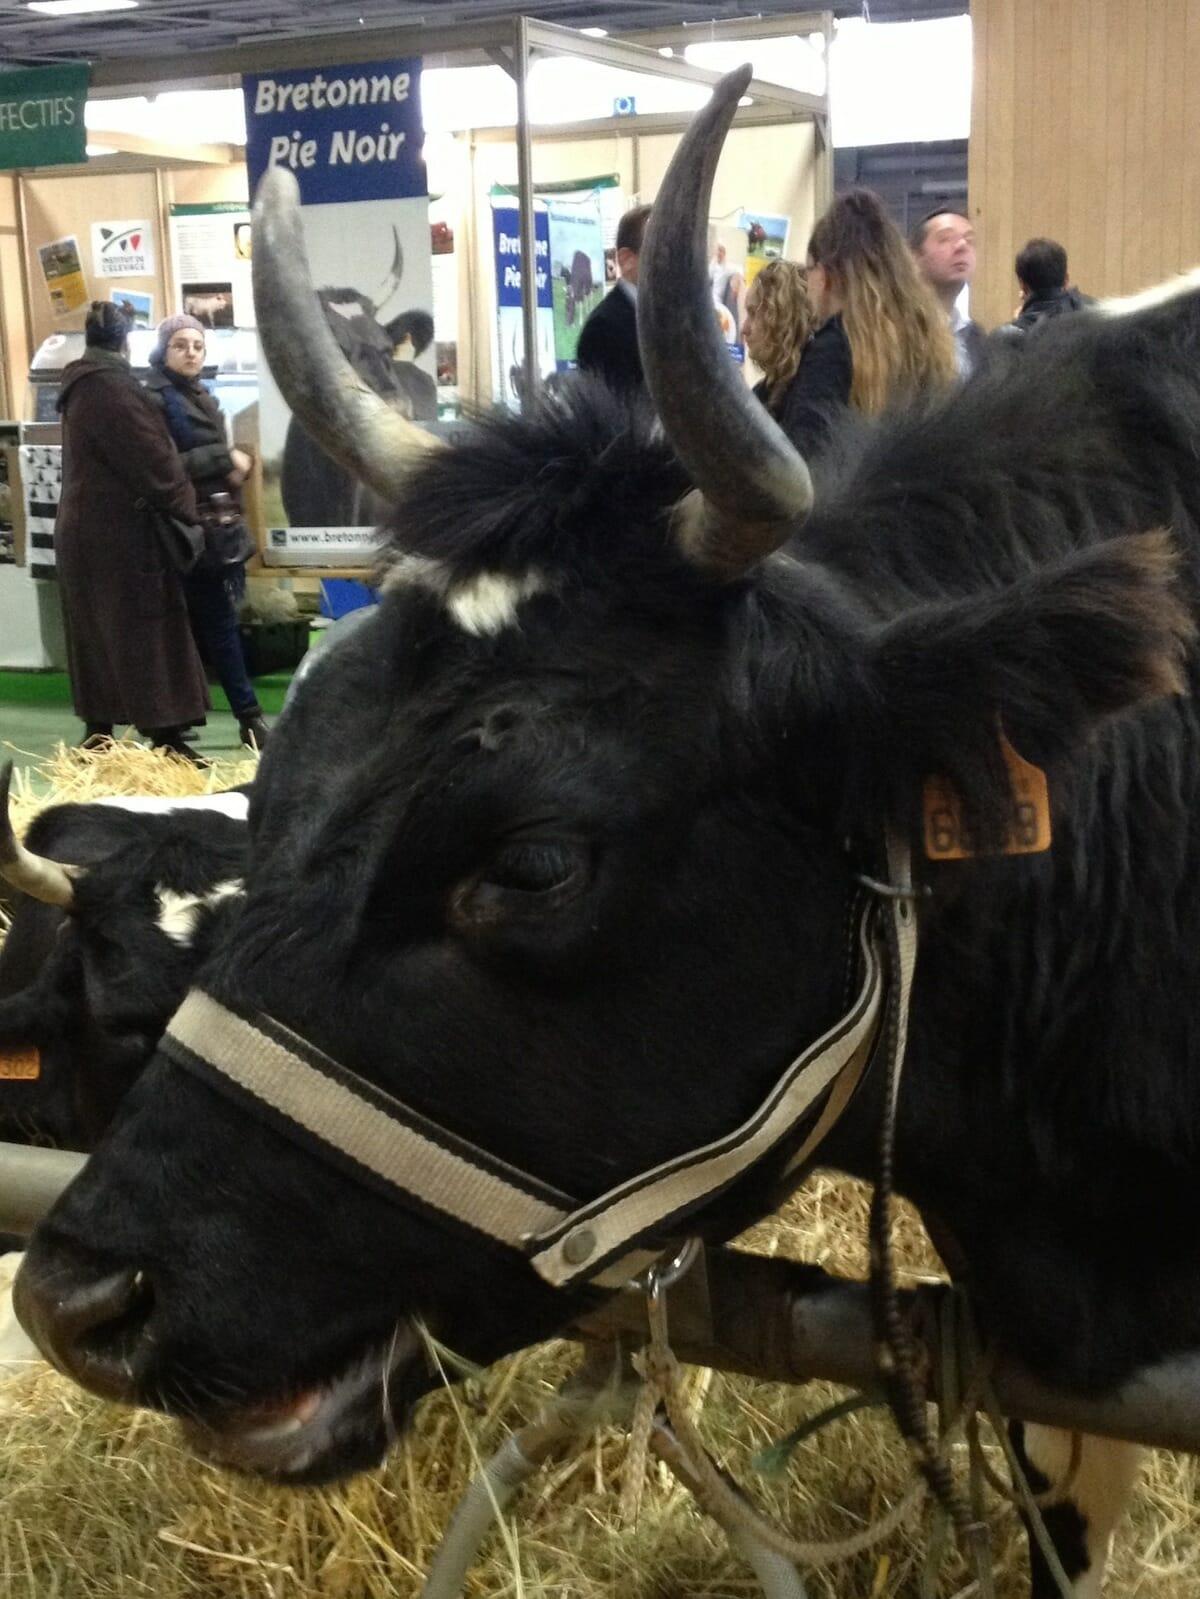 cow-10-BretonnePieNoir